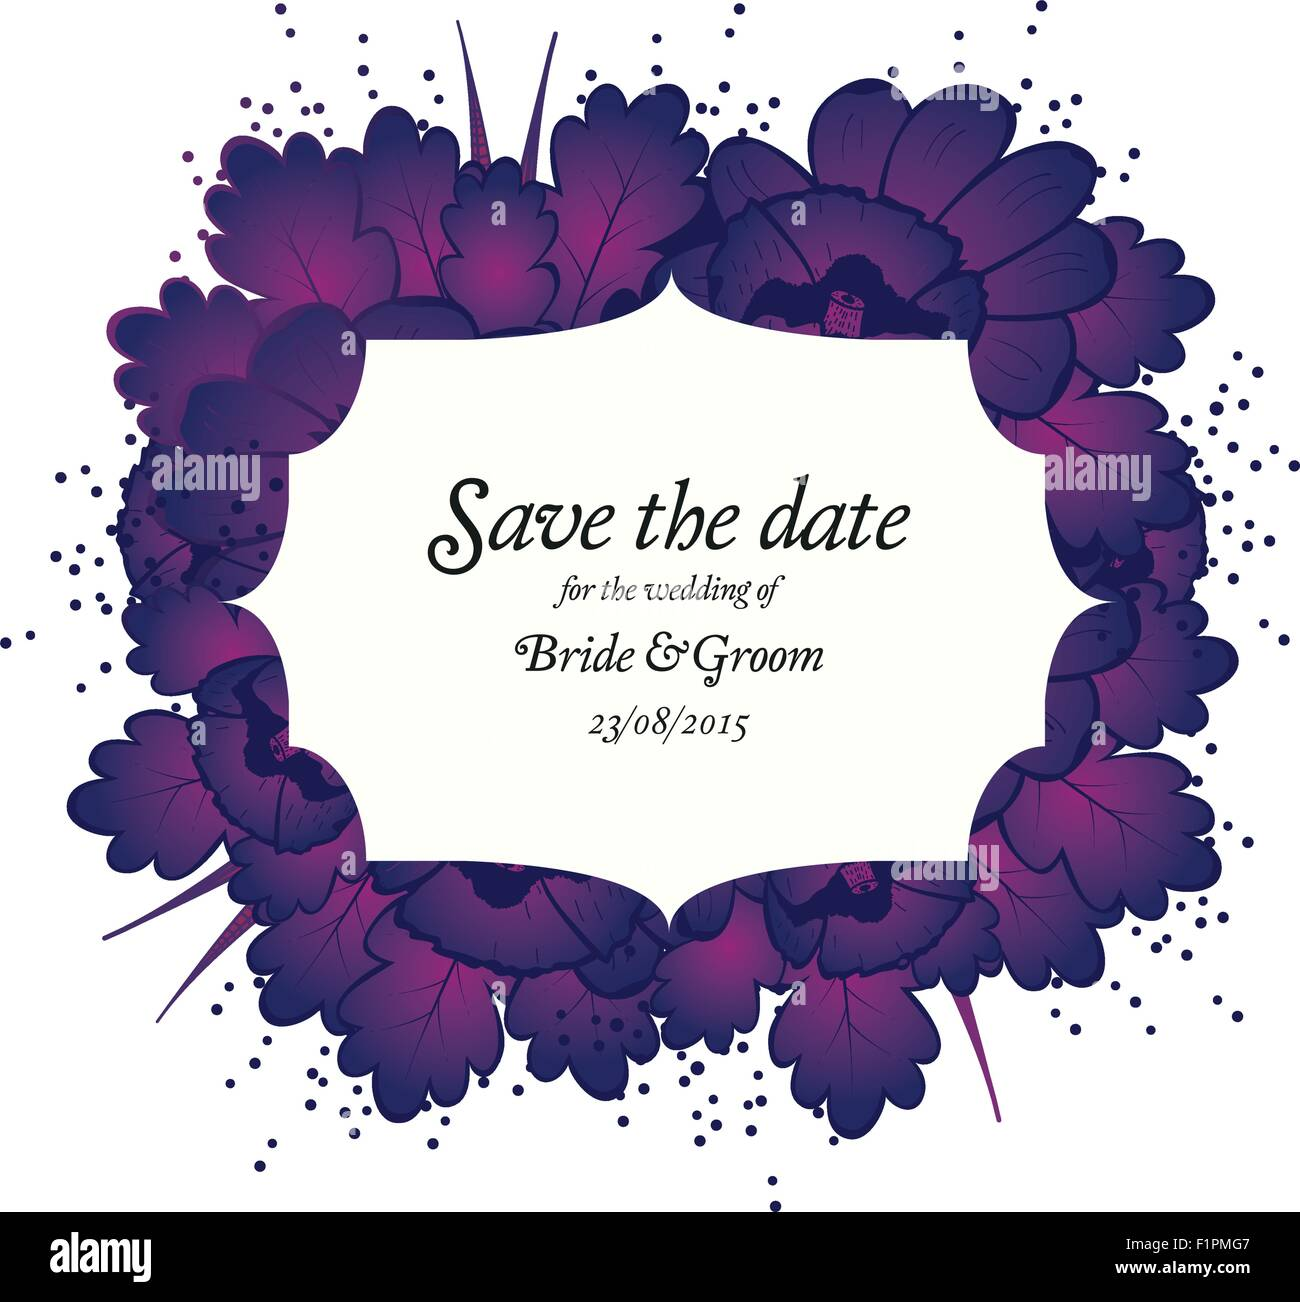 Wedding invitation card with purple flowers Vector illustration ...